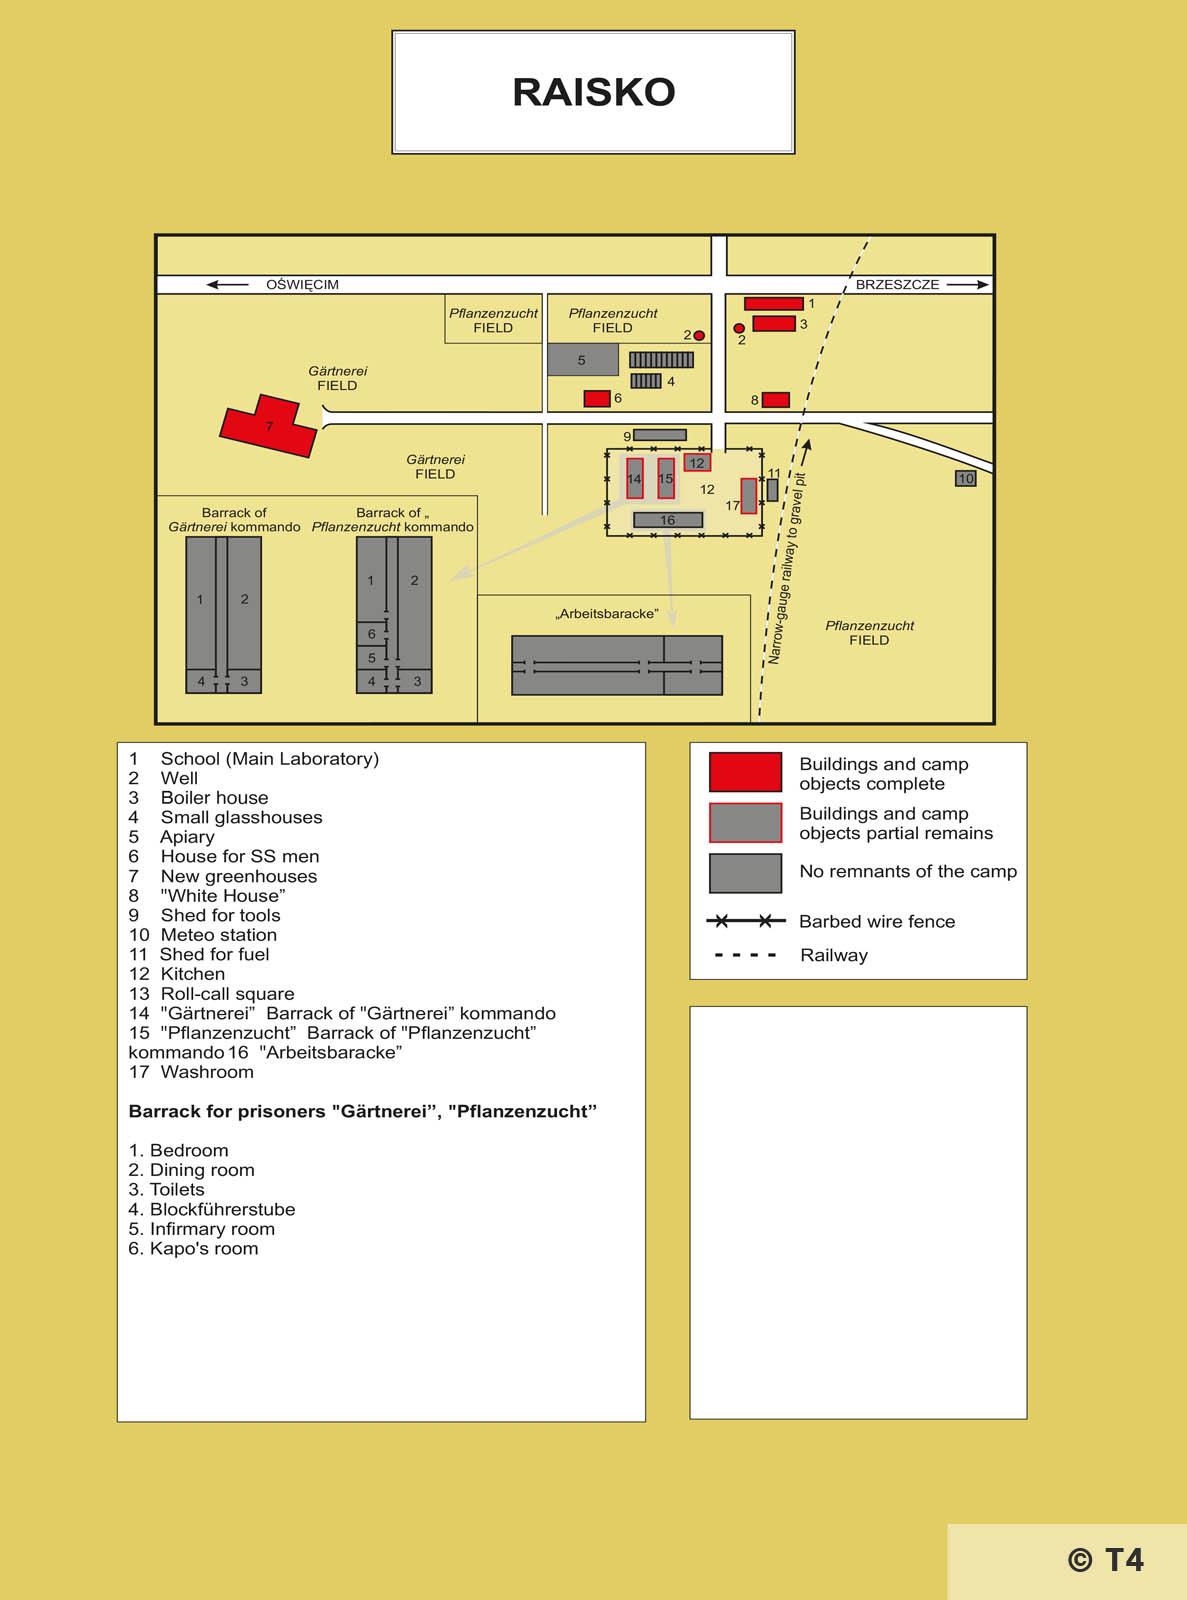 Map of Raisko sub camp and area. T4